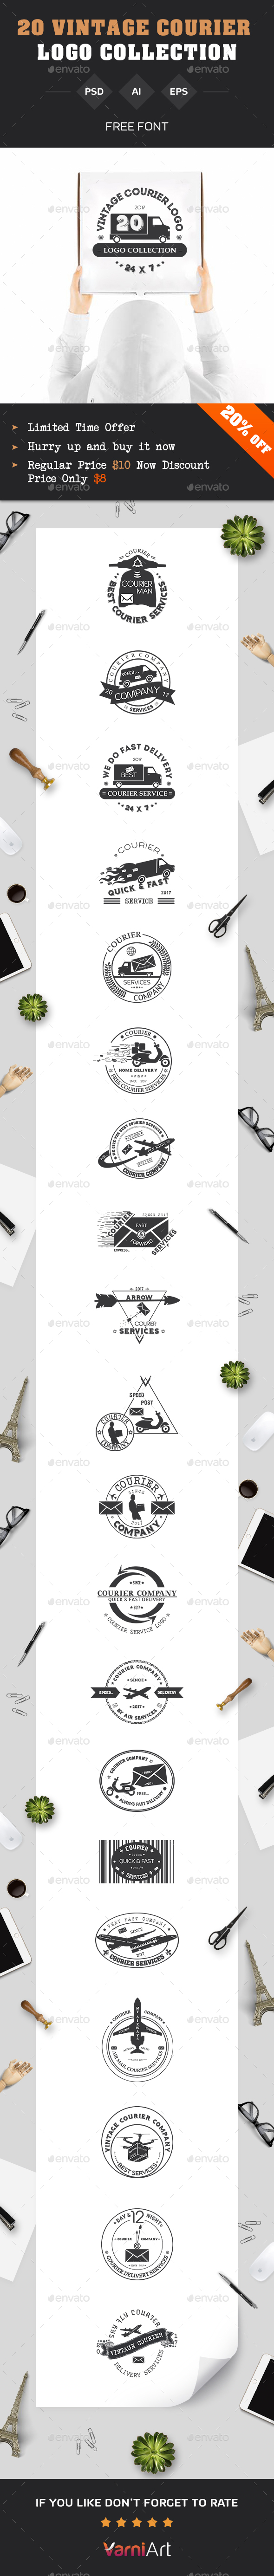 20 Courier Vintage Labels Templates PSD, Vector EPS, AI Illustrator ...